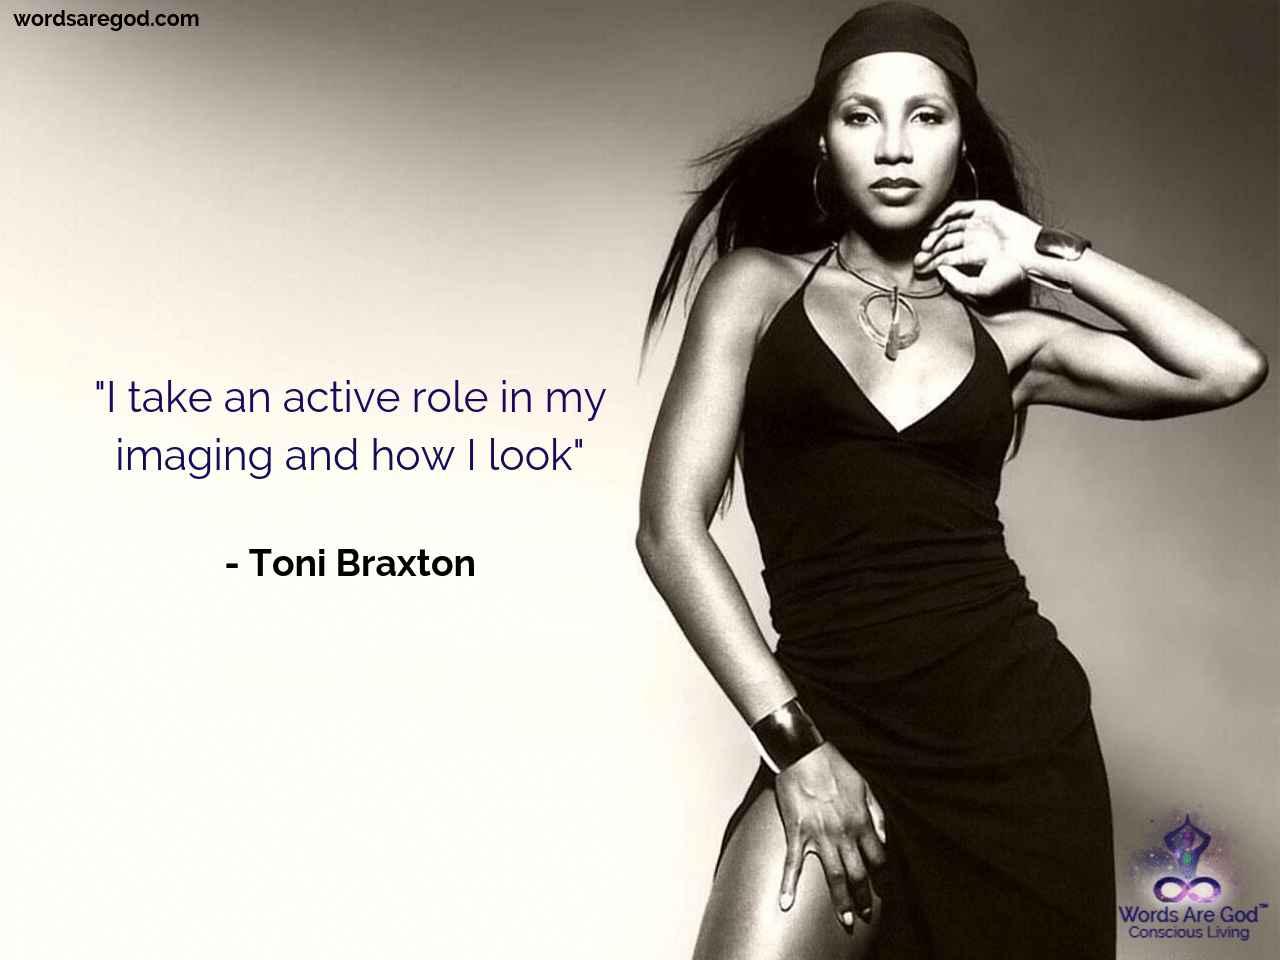 Toni Braxton Music Quote by Toni Braxton